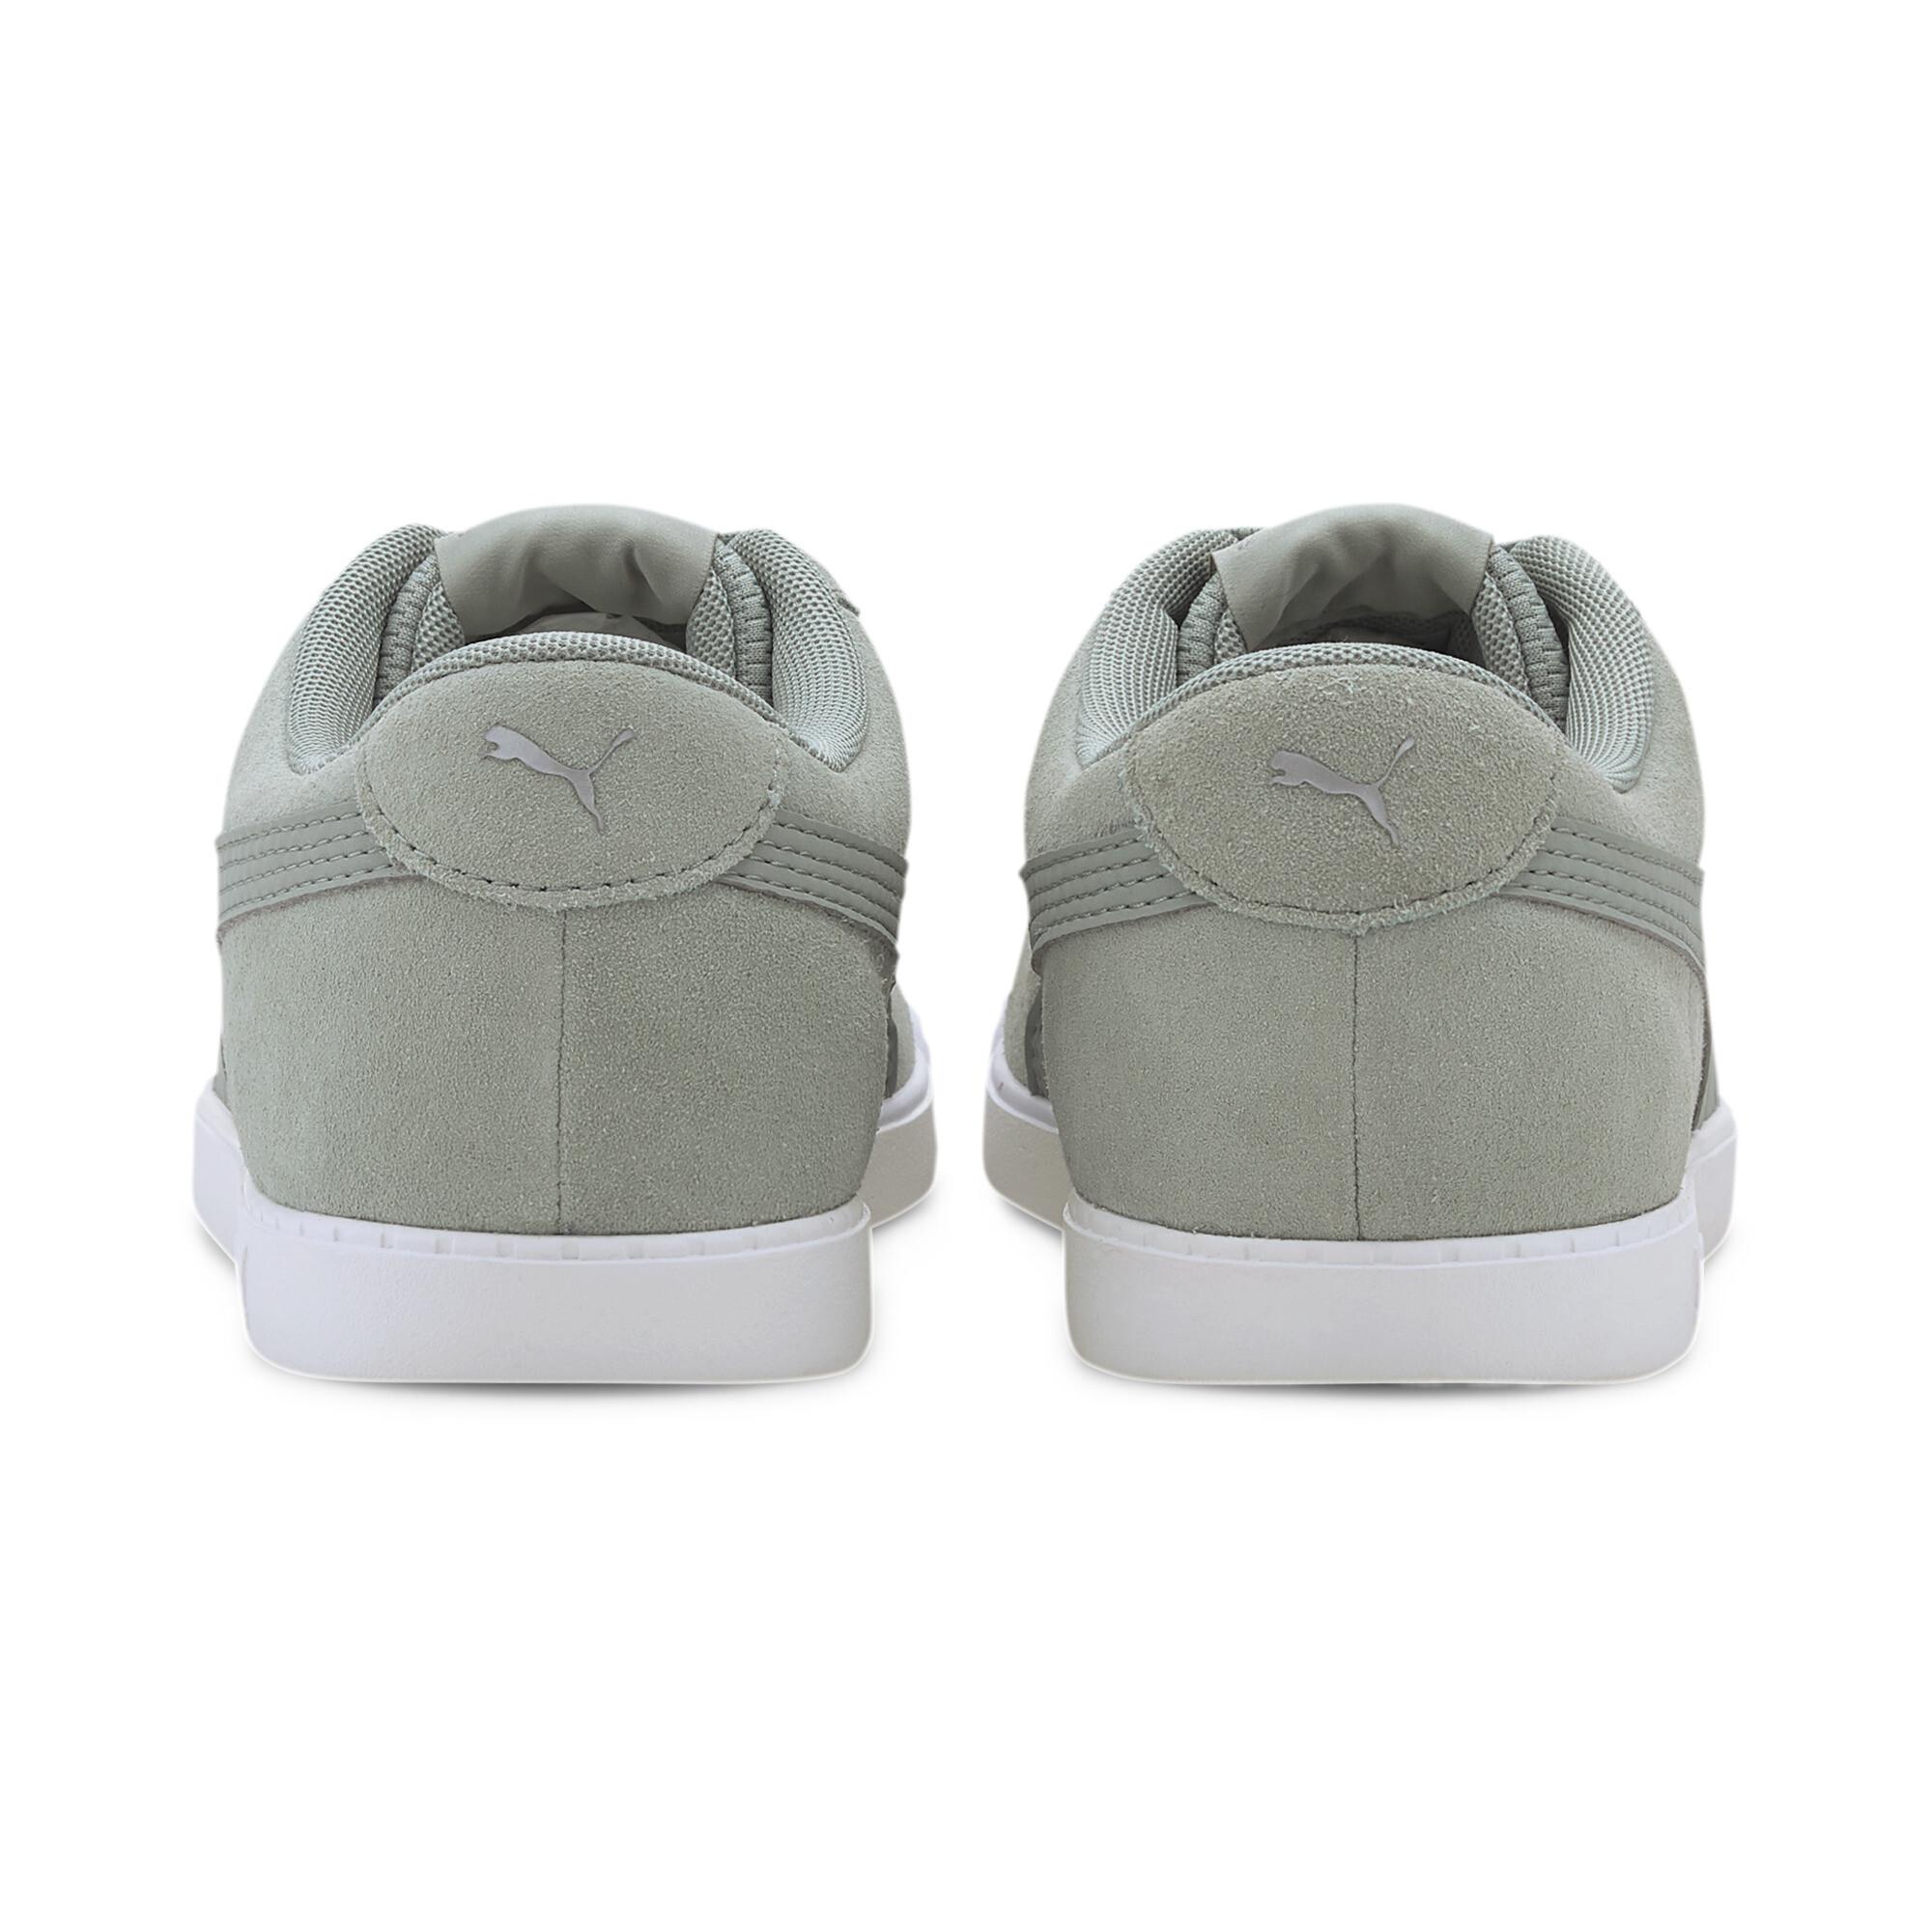 PUMA-Women-039-s-Carina-Slim-Suede-Sneakers thumbnail 24